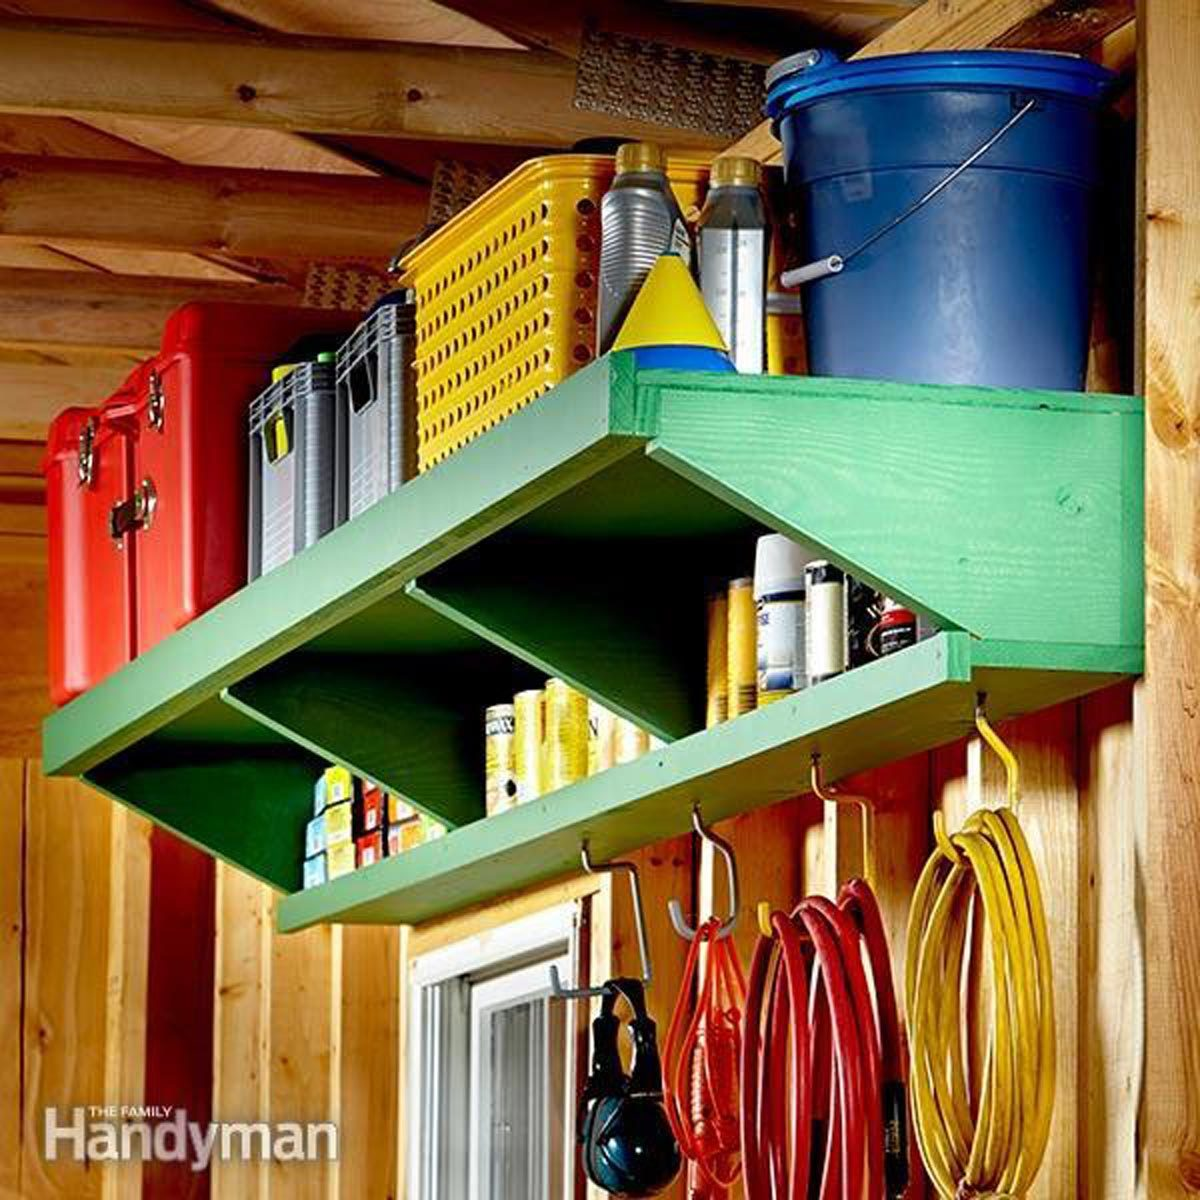 double-decker-storage-shelves